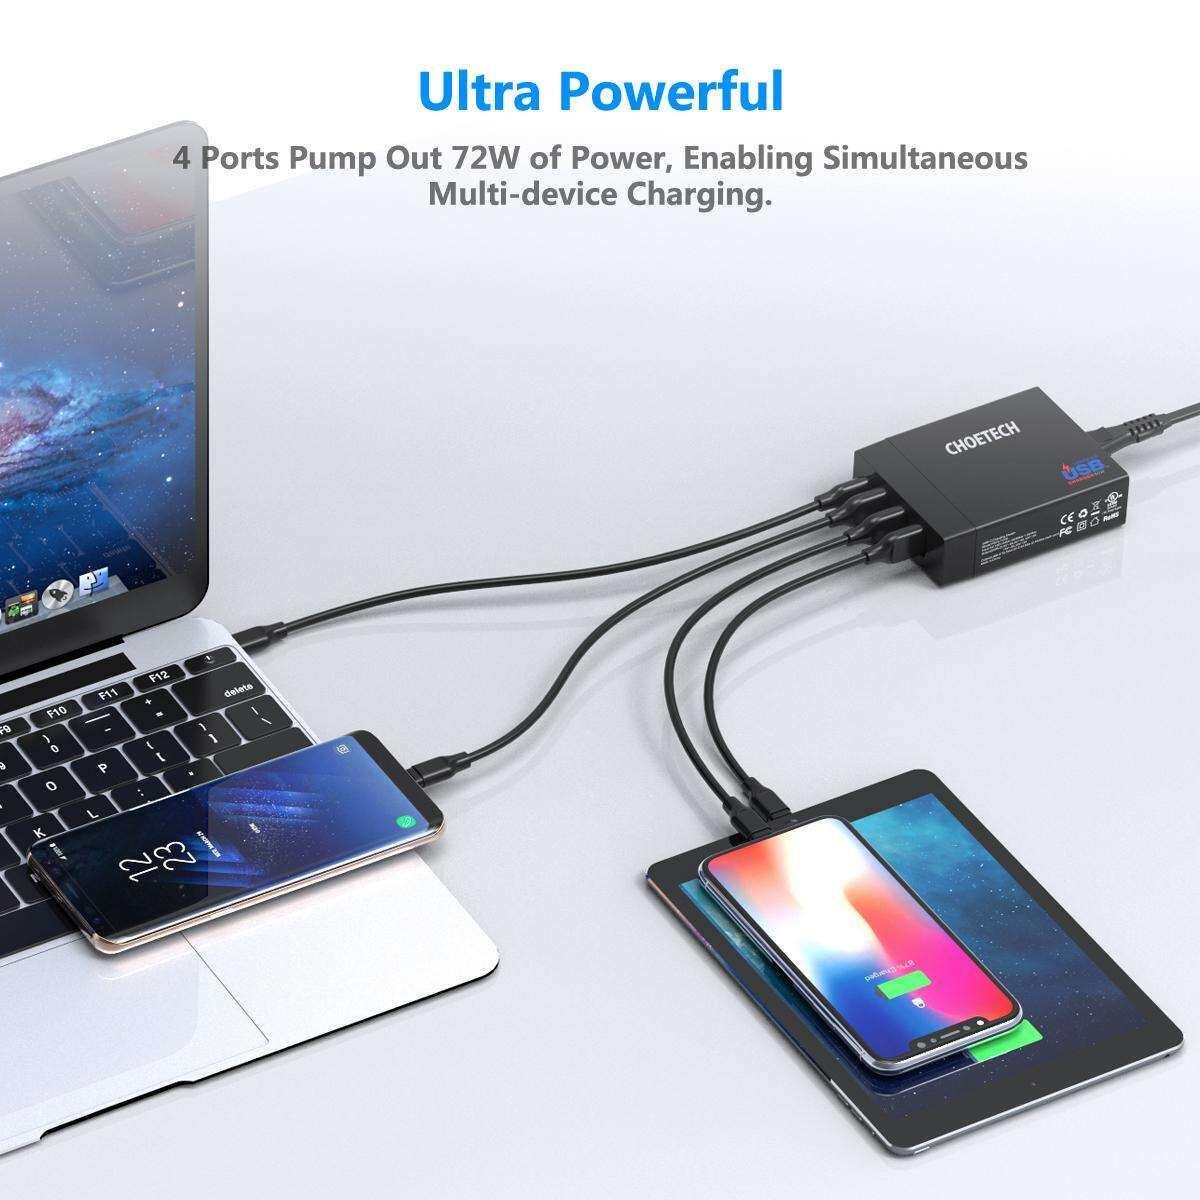 CHOETECH อแดปเตอร์ชาร์จไฟ 72W 4 พอร์ต USB C พร้อมพอร์ต 60W Power Delivery รองรับ MacBook,iPad Pro 2018,iPhone Xs Max/XR/X/8,S10/S9/S8,Nintendo Switch และอีกมากมาย